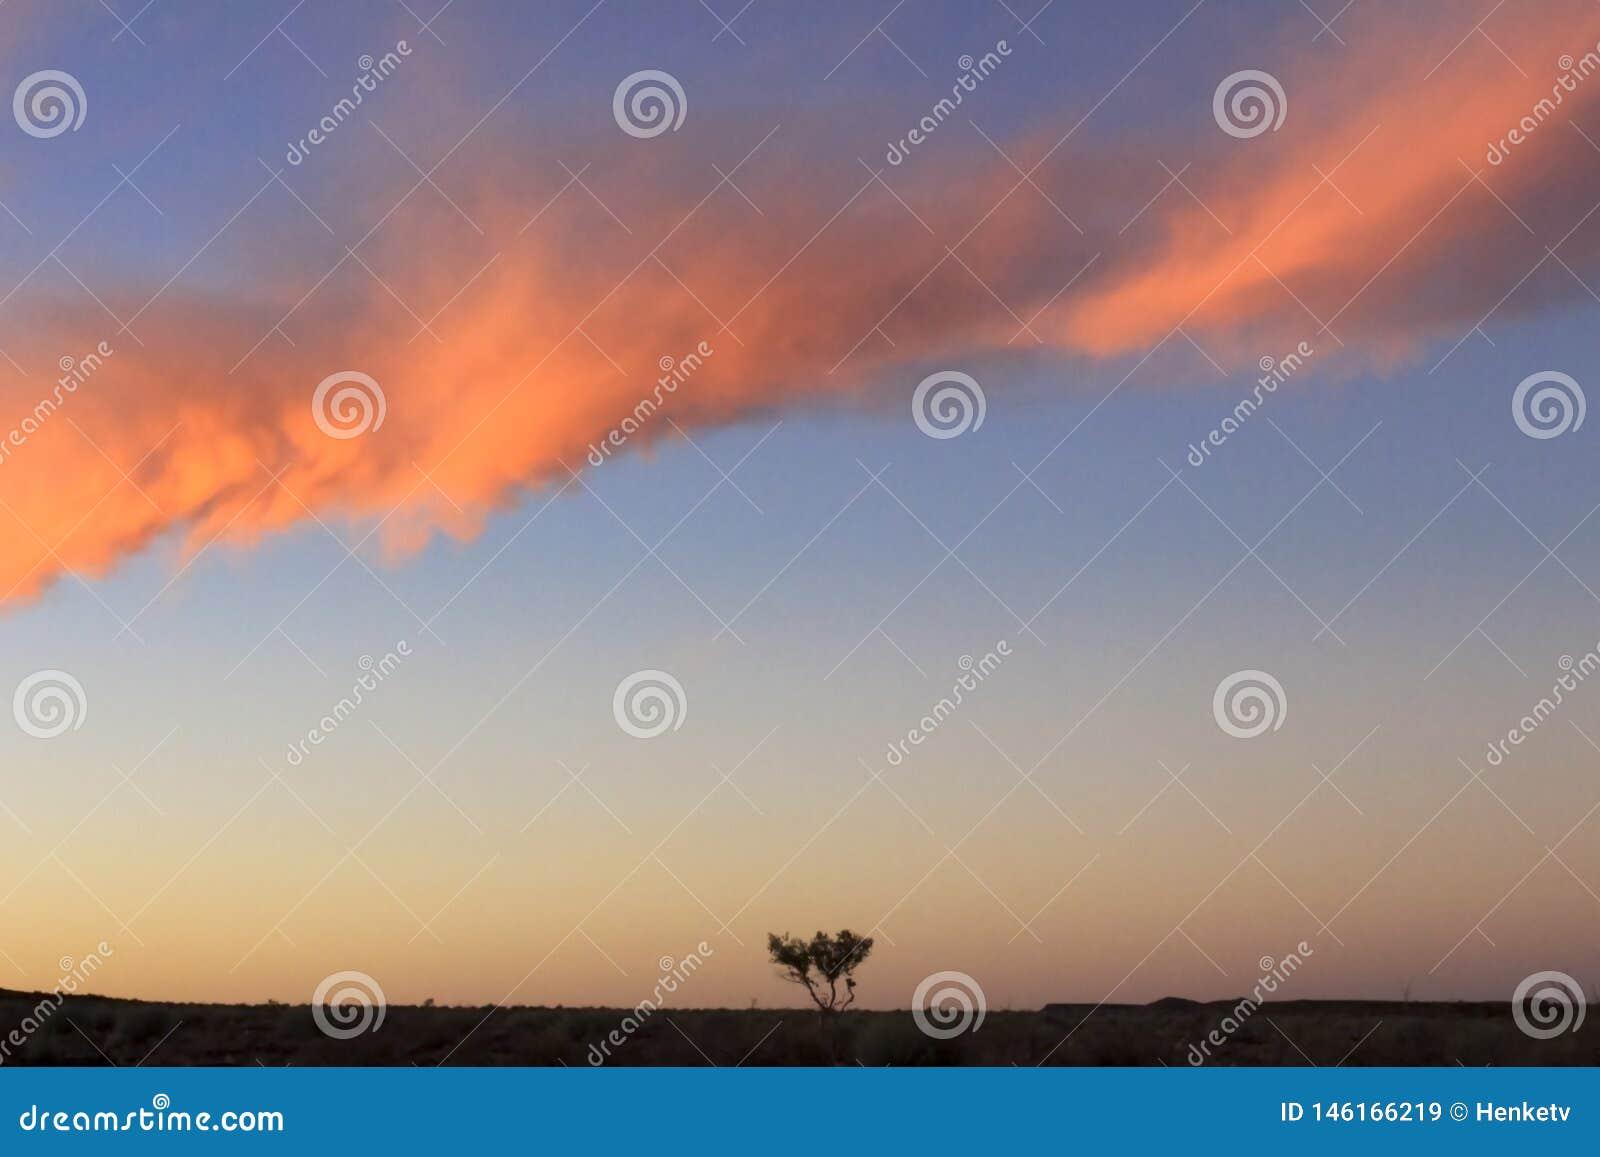 Сиротливое дерево и красивые облака